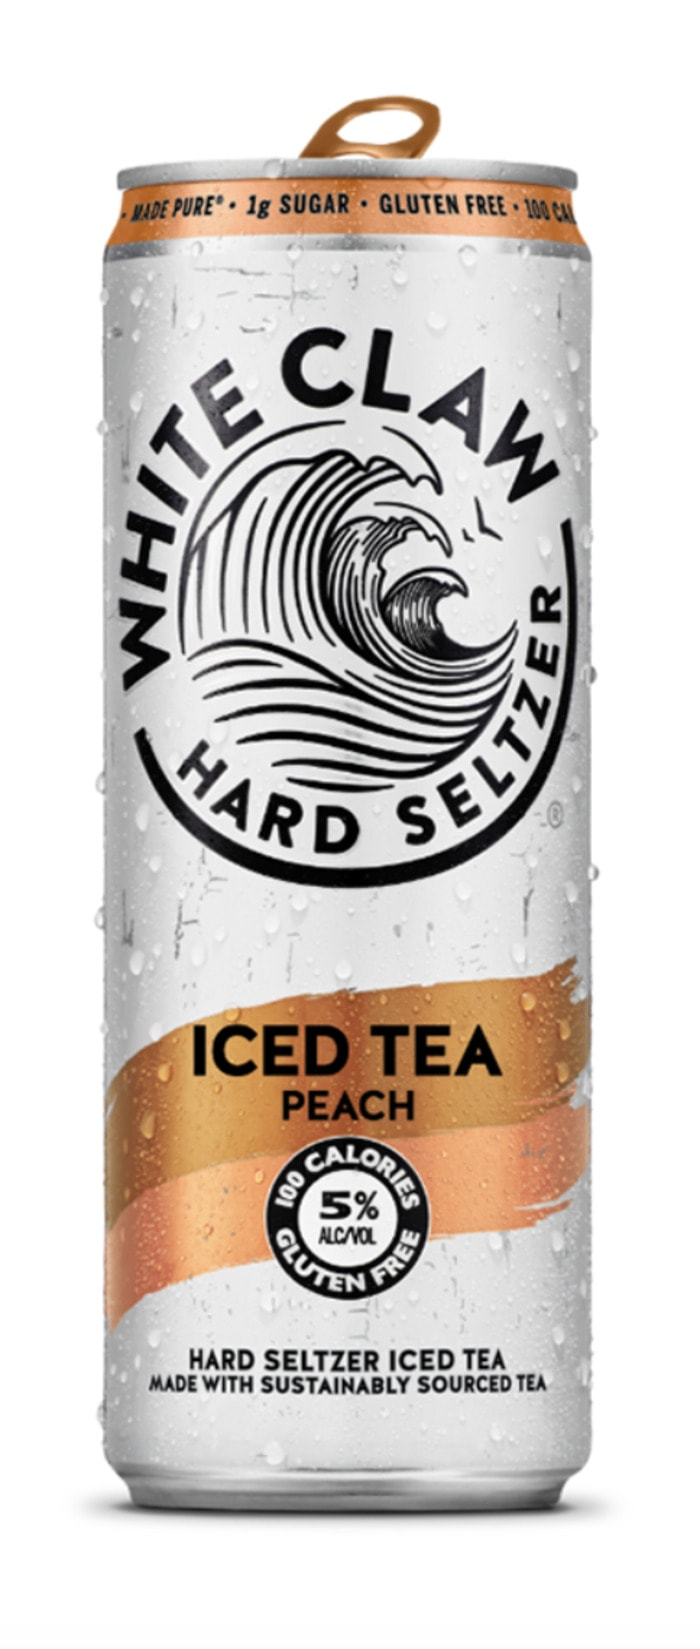 White Claw Iced Tea - peach flavored hard seltzer tea